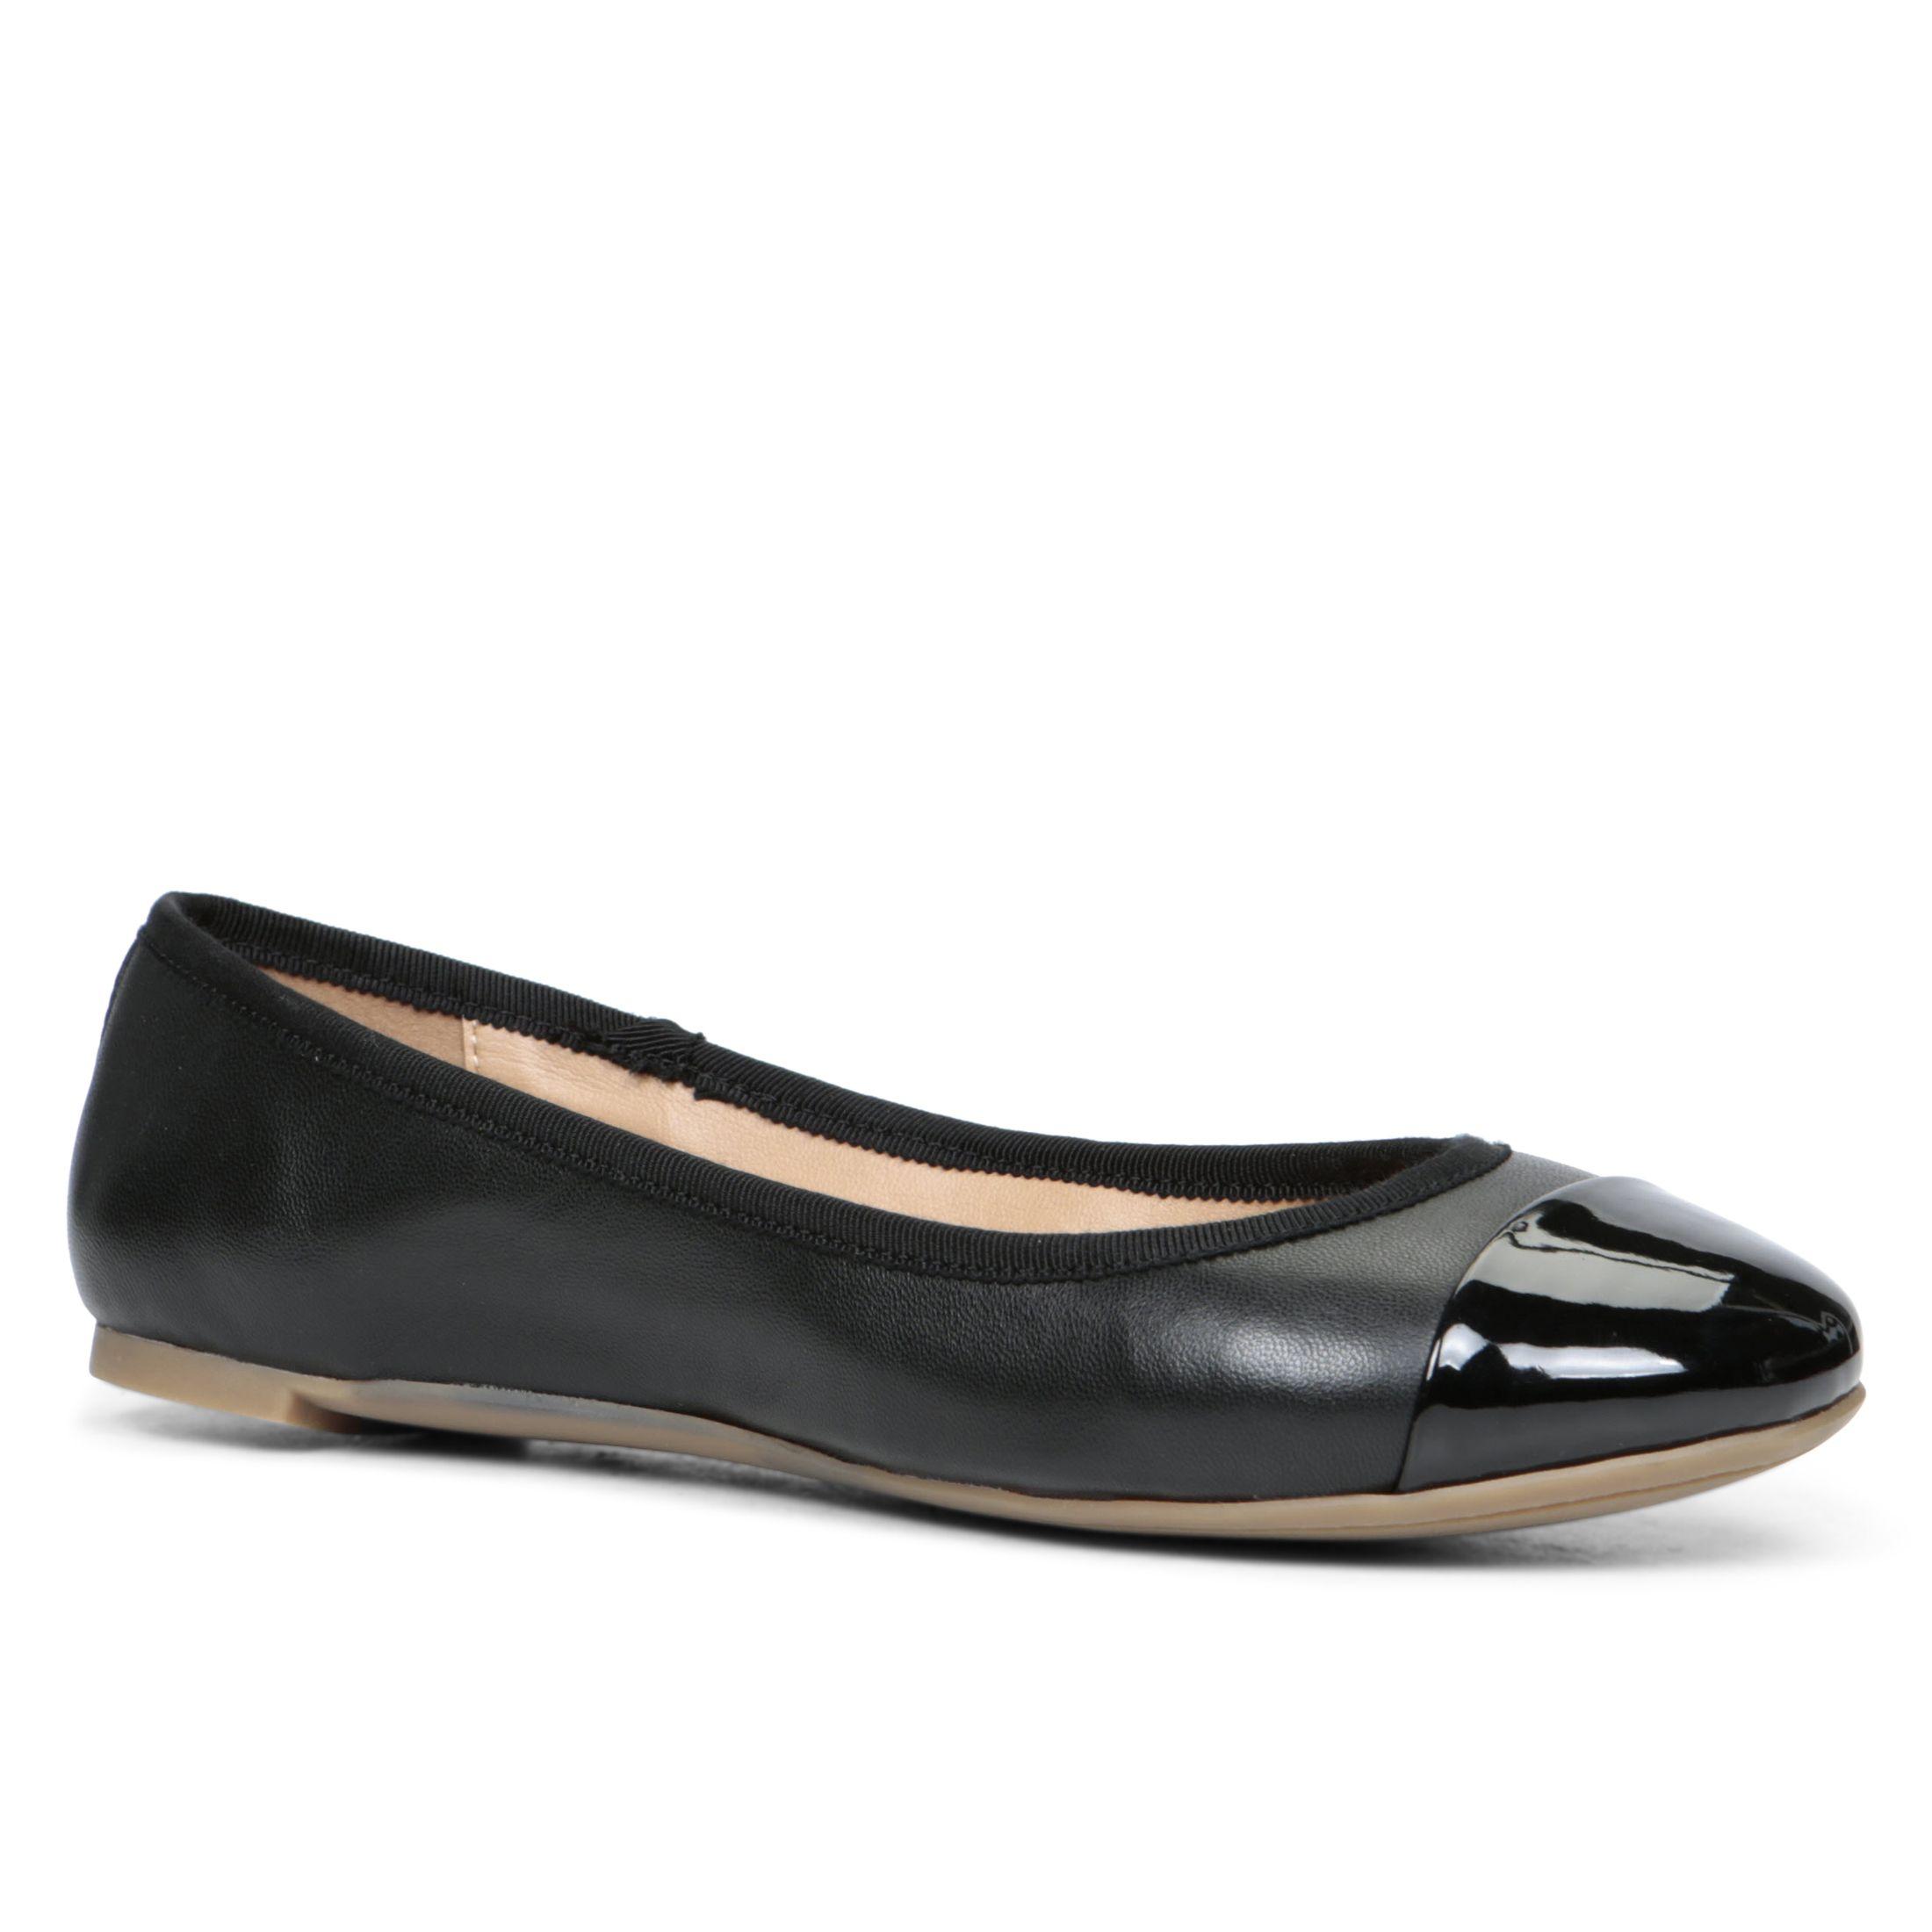 aldo ocaun toe ballerina shoes in black lyst